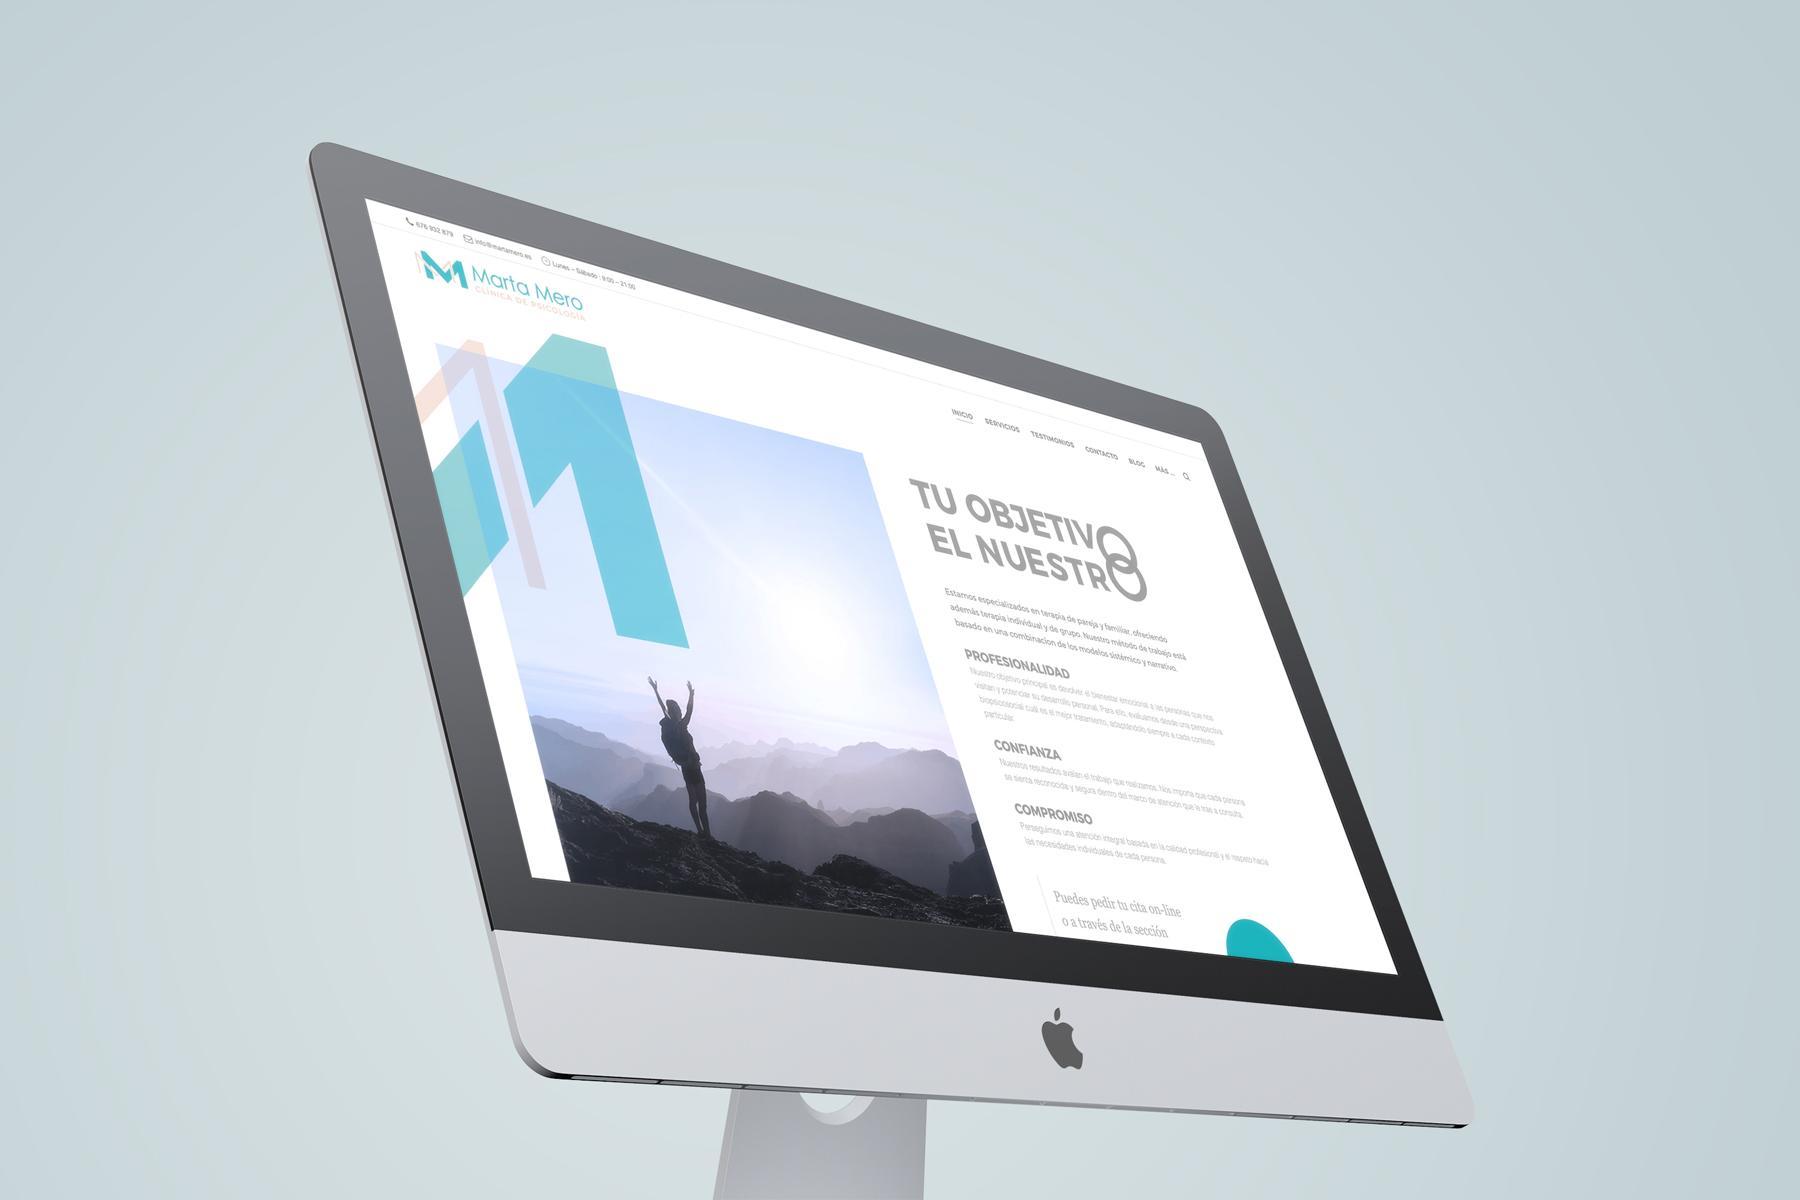 Diseño Web Marta Mero